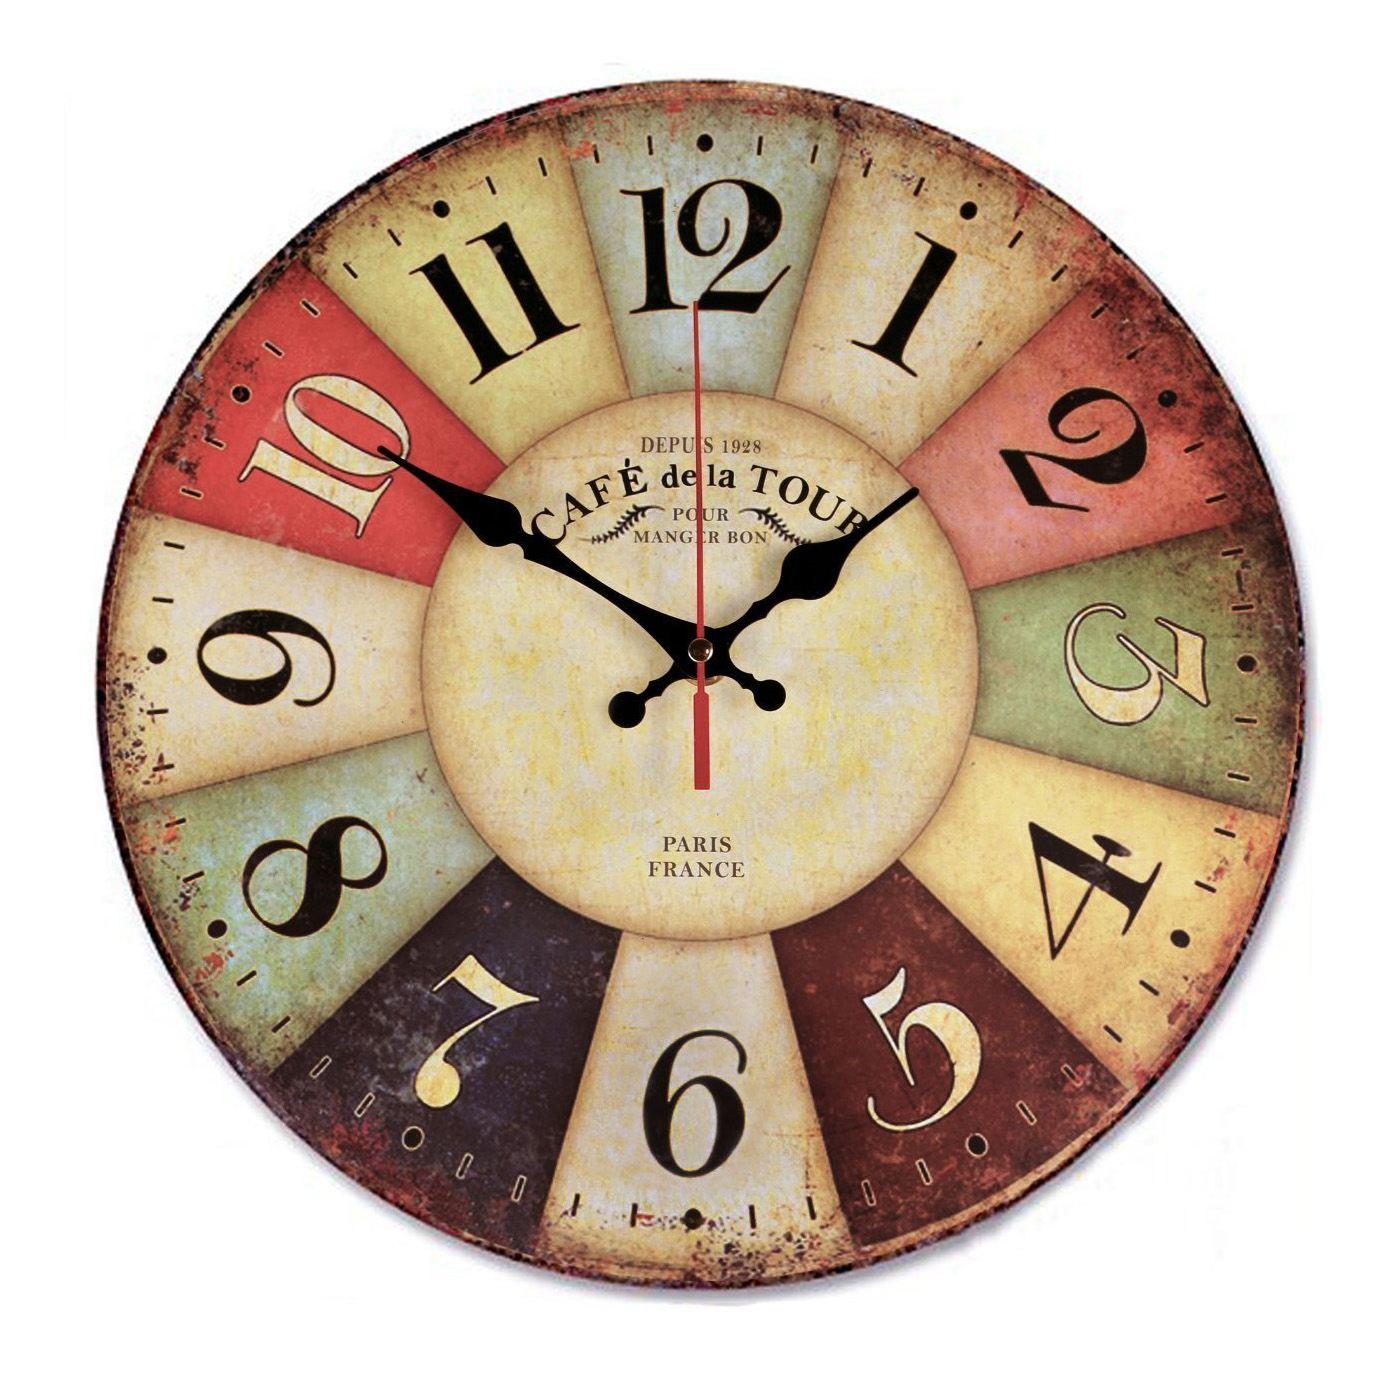 12 Inch Retro Wooden Wall Clock Farmhouse Decor, Silent Non Ticking Wall Clocks Large Decorative - Big Wood Atomic Analog Batt